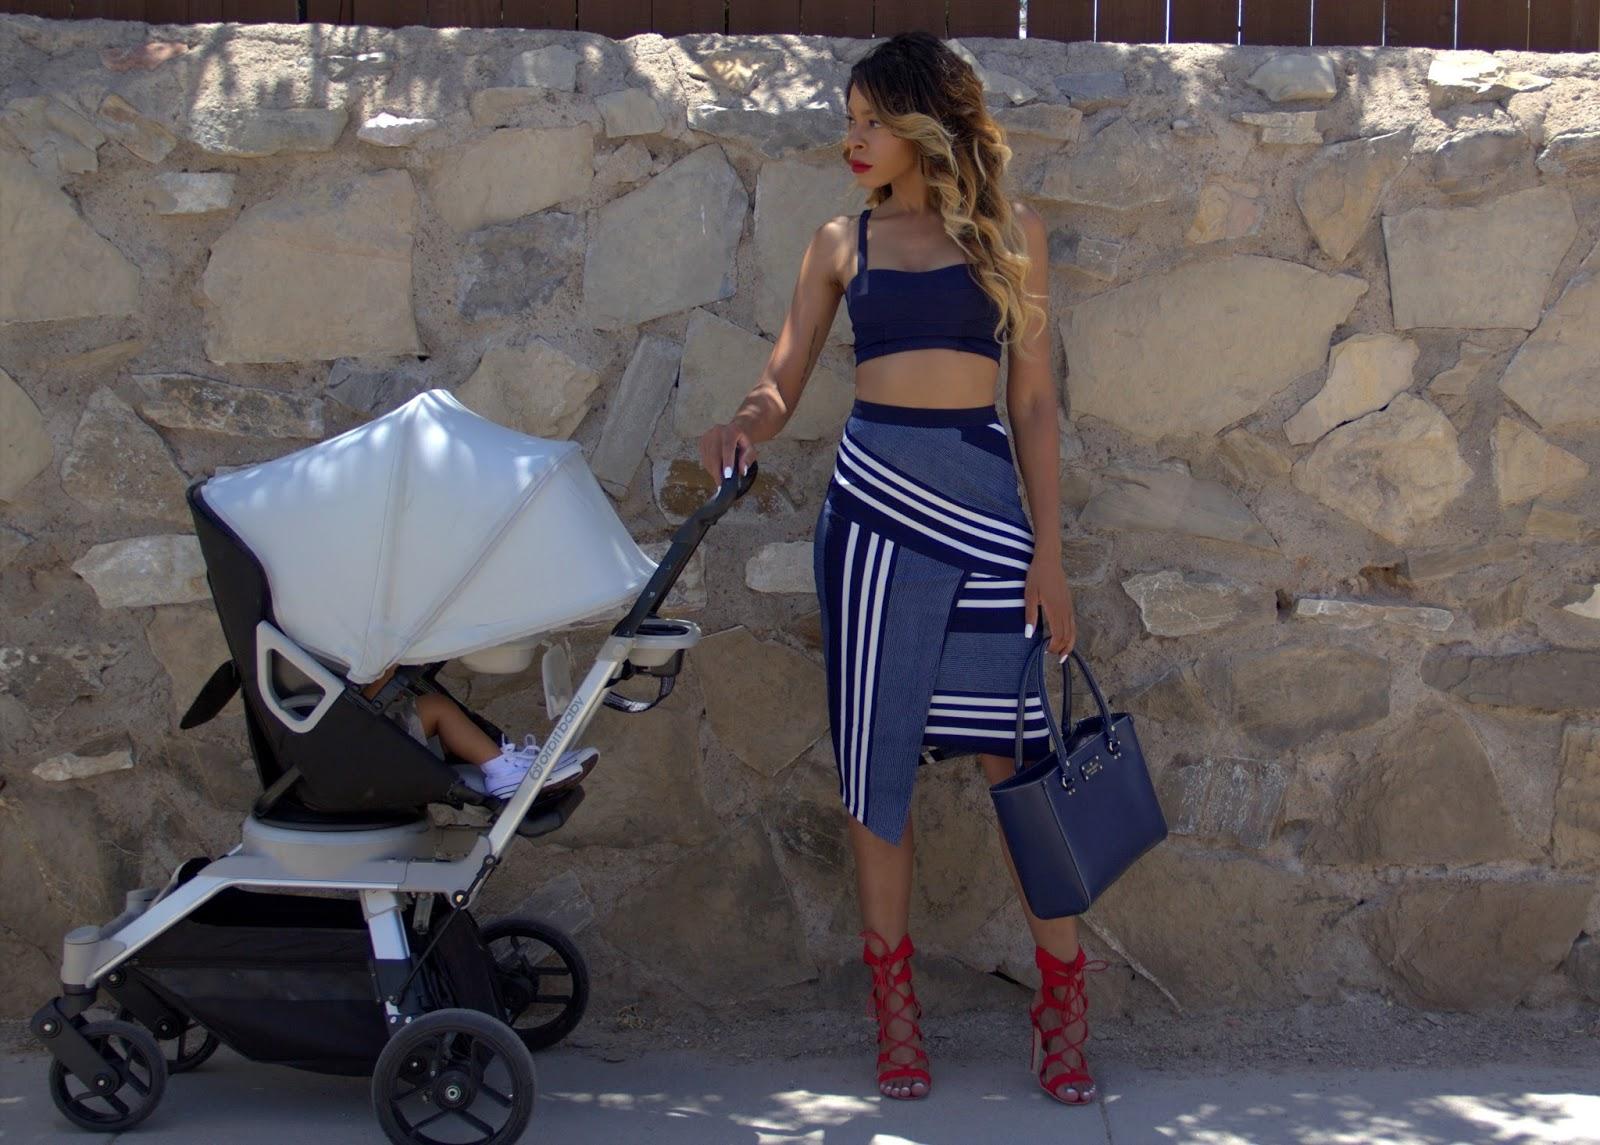 allthingsslim, ombre hair, orbit baby stroller, pencil skirt outfit